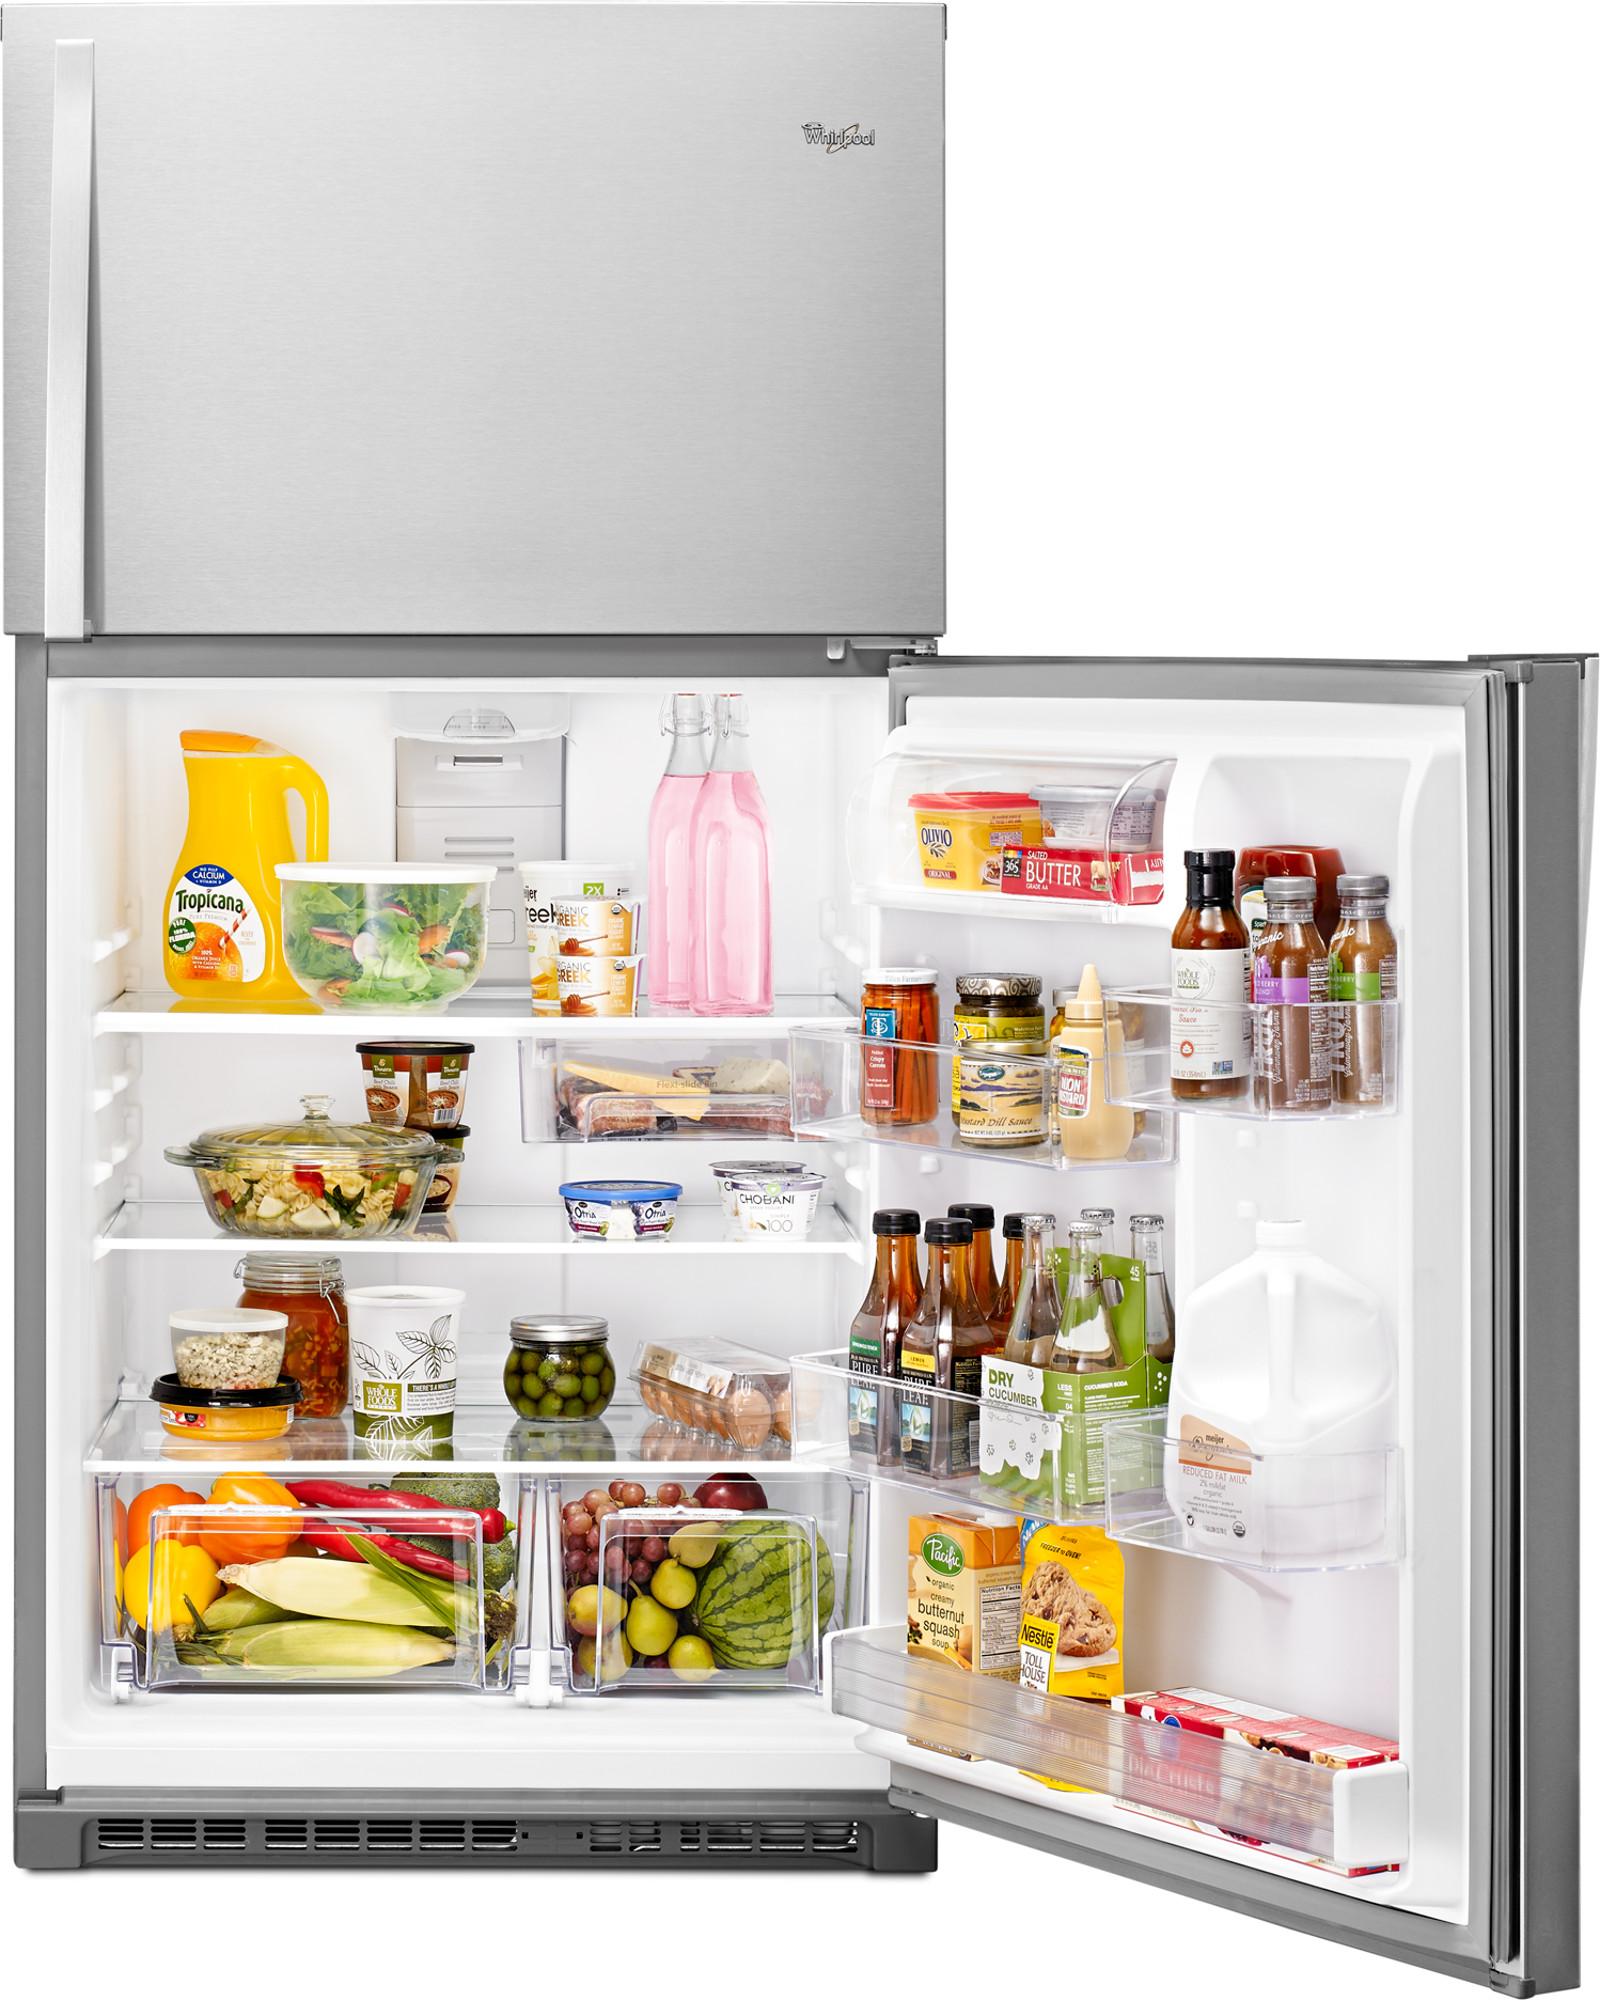 Whirlpool WRT511SZDM 21 cu. ft. Top Freezer Refrigerator w/ LED Interior Lighting - Stainless Steel